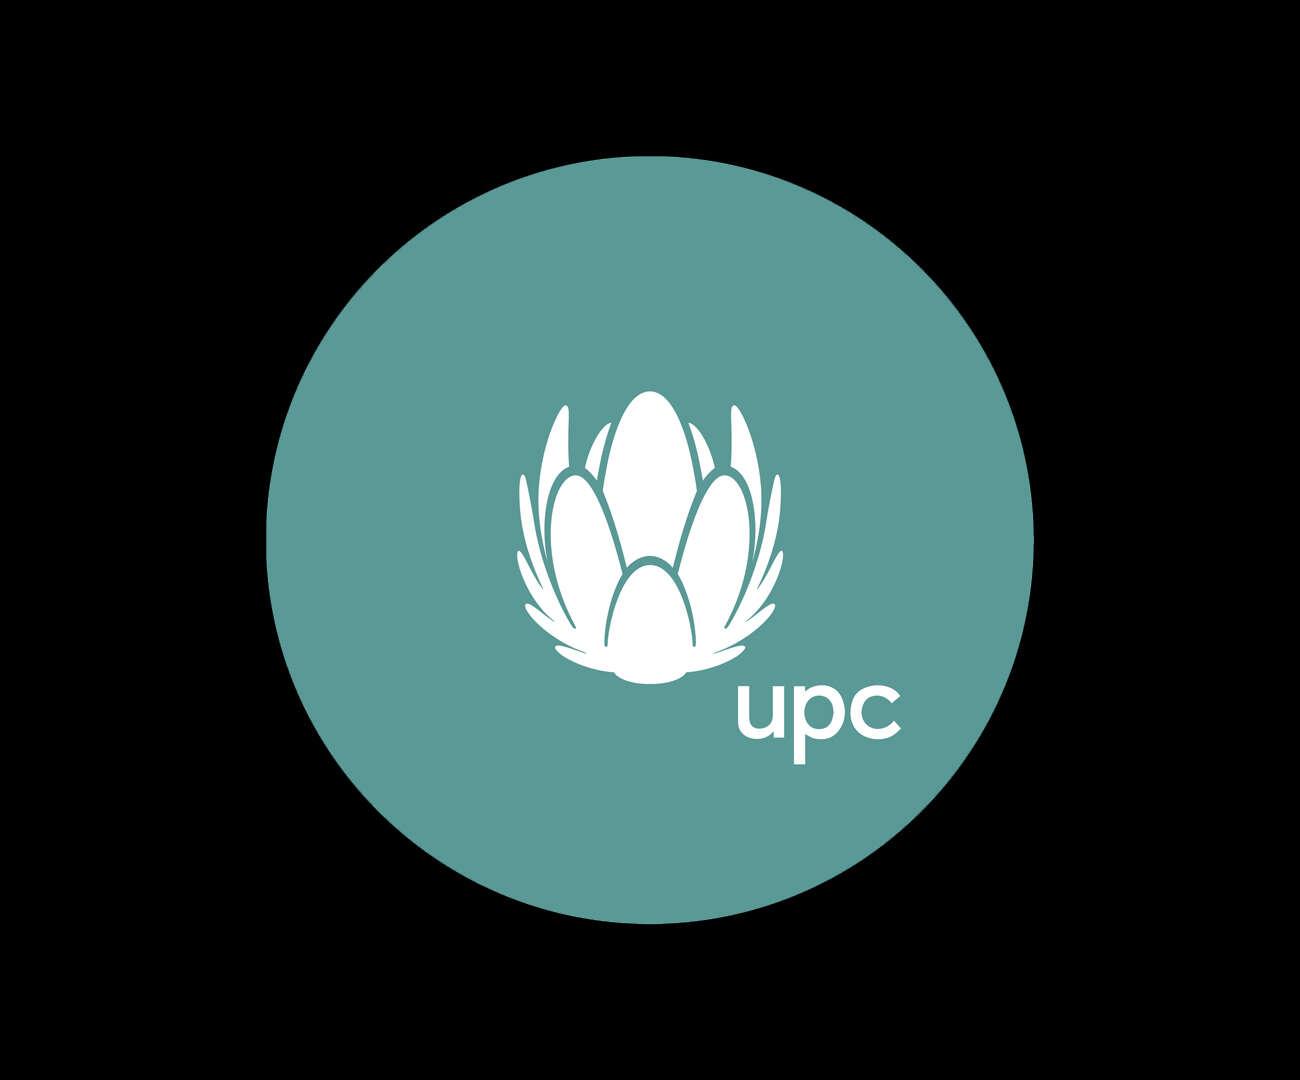 Klienci UPC dostaną rekompensatę od operatora